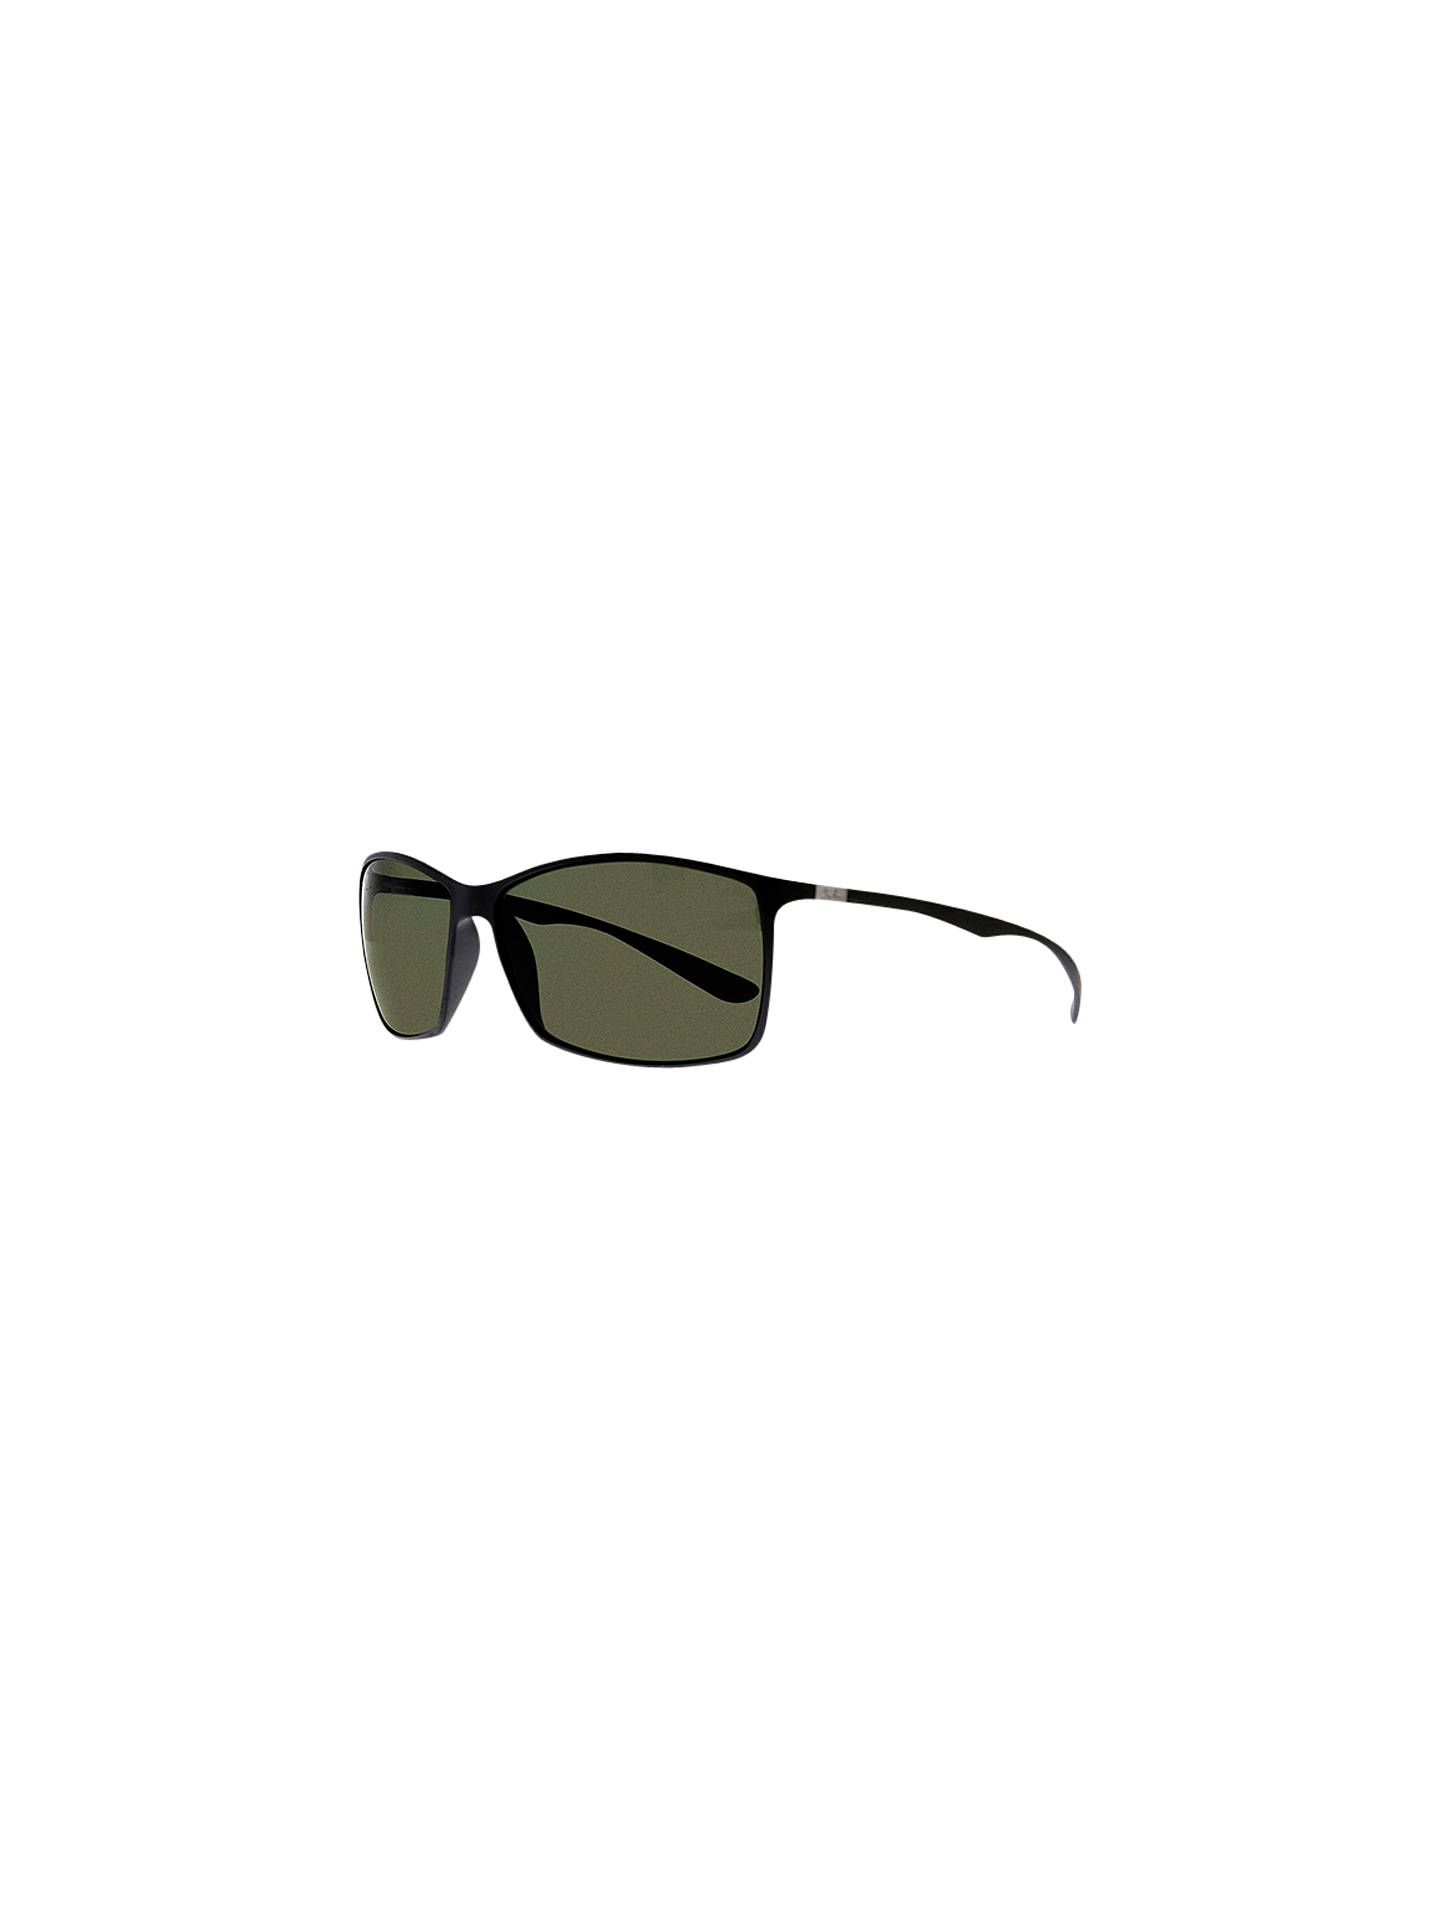 80b4220f54 BuyRay-Ban RB4179 TECH Liteforce Polarised Sunglasses